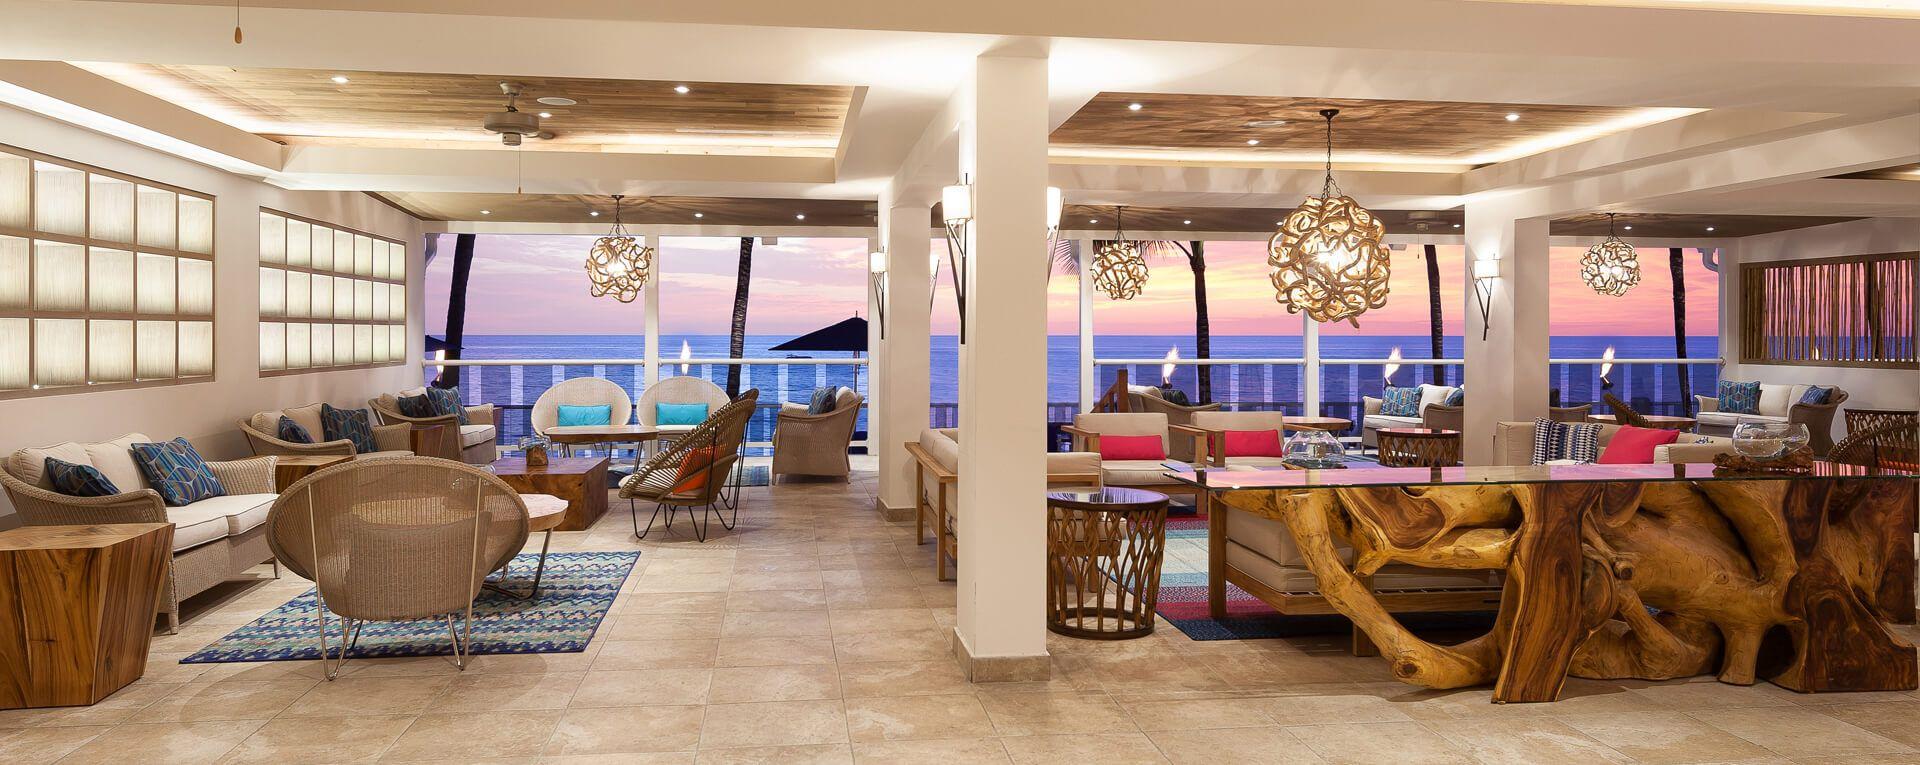 Waves Hotel & Spa by Elegant Hotels